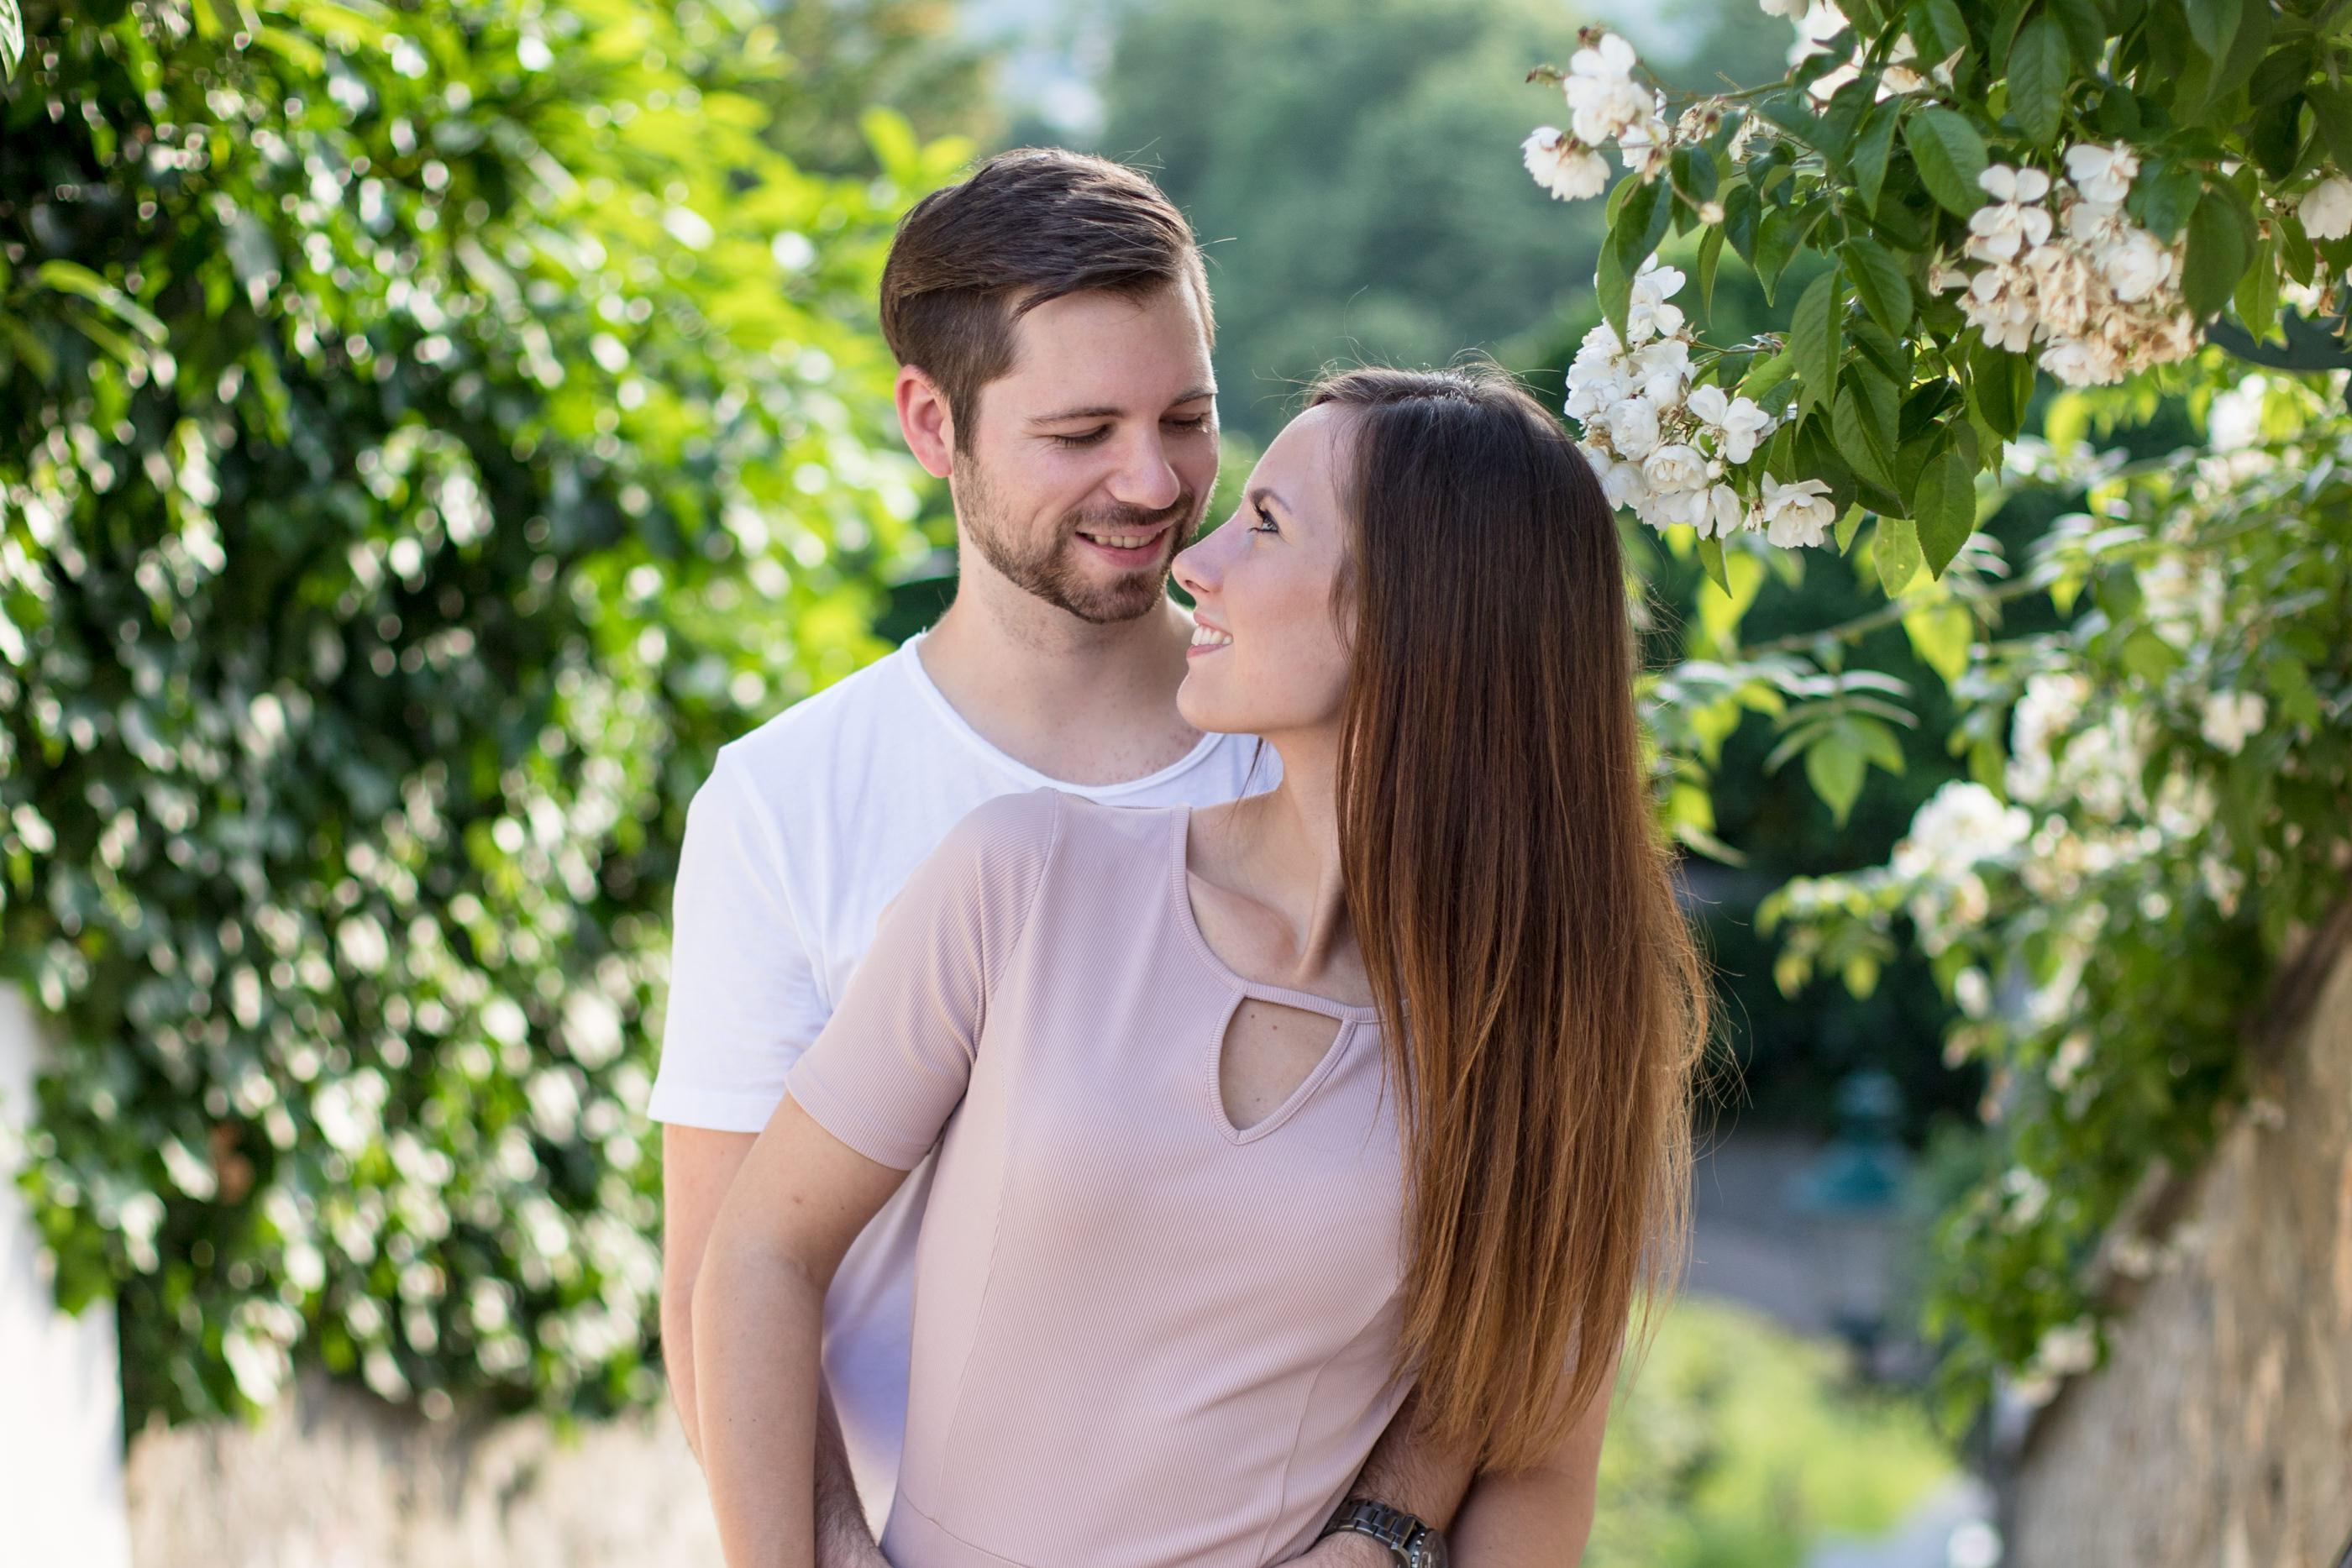 Jugendnetzwerk Oststeiermark: Speed-Dating mal anders